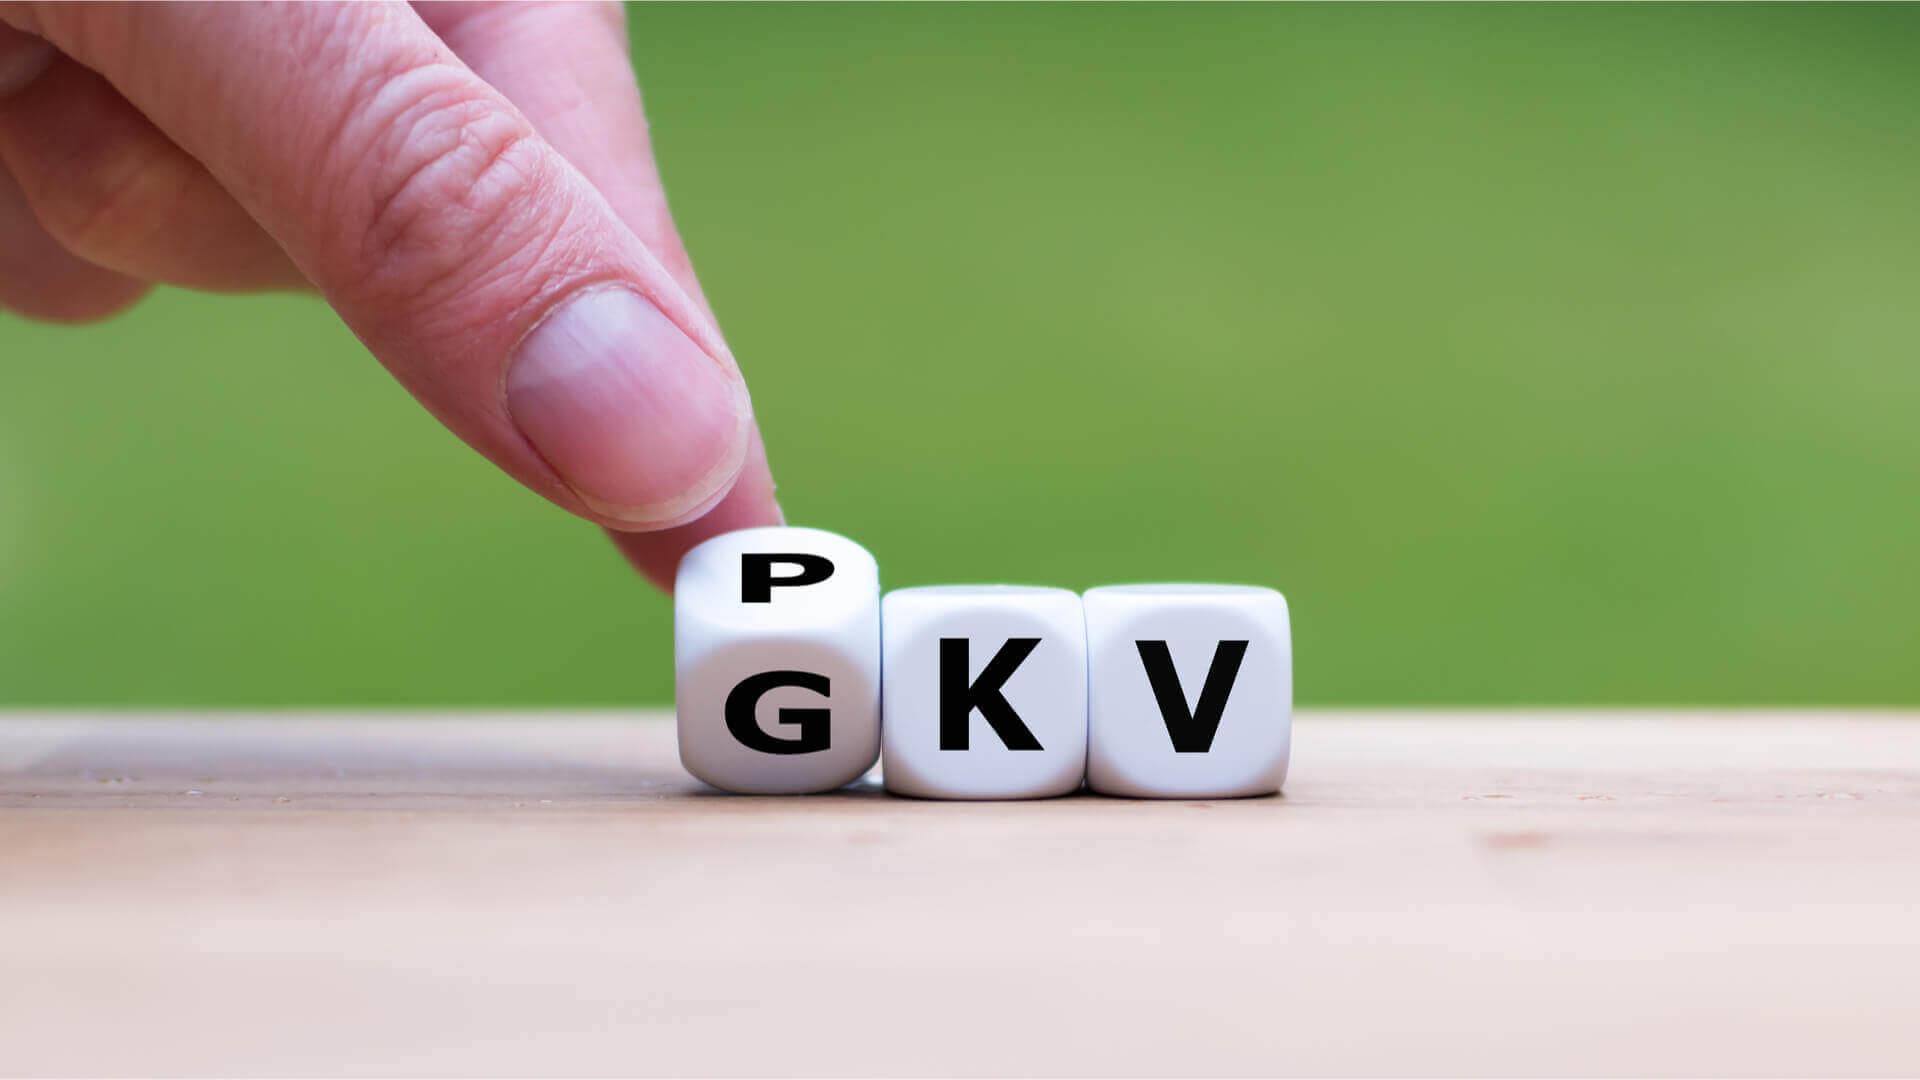 Private oder gesetzliche Krankenversicherung – PKV vs. GKV